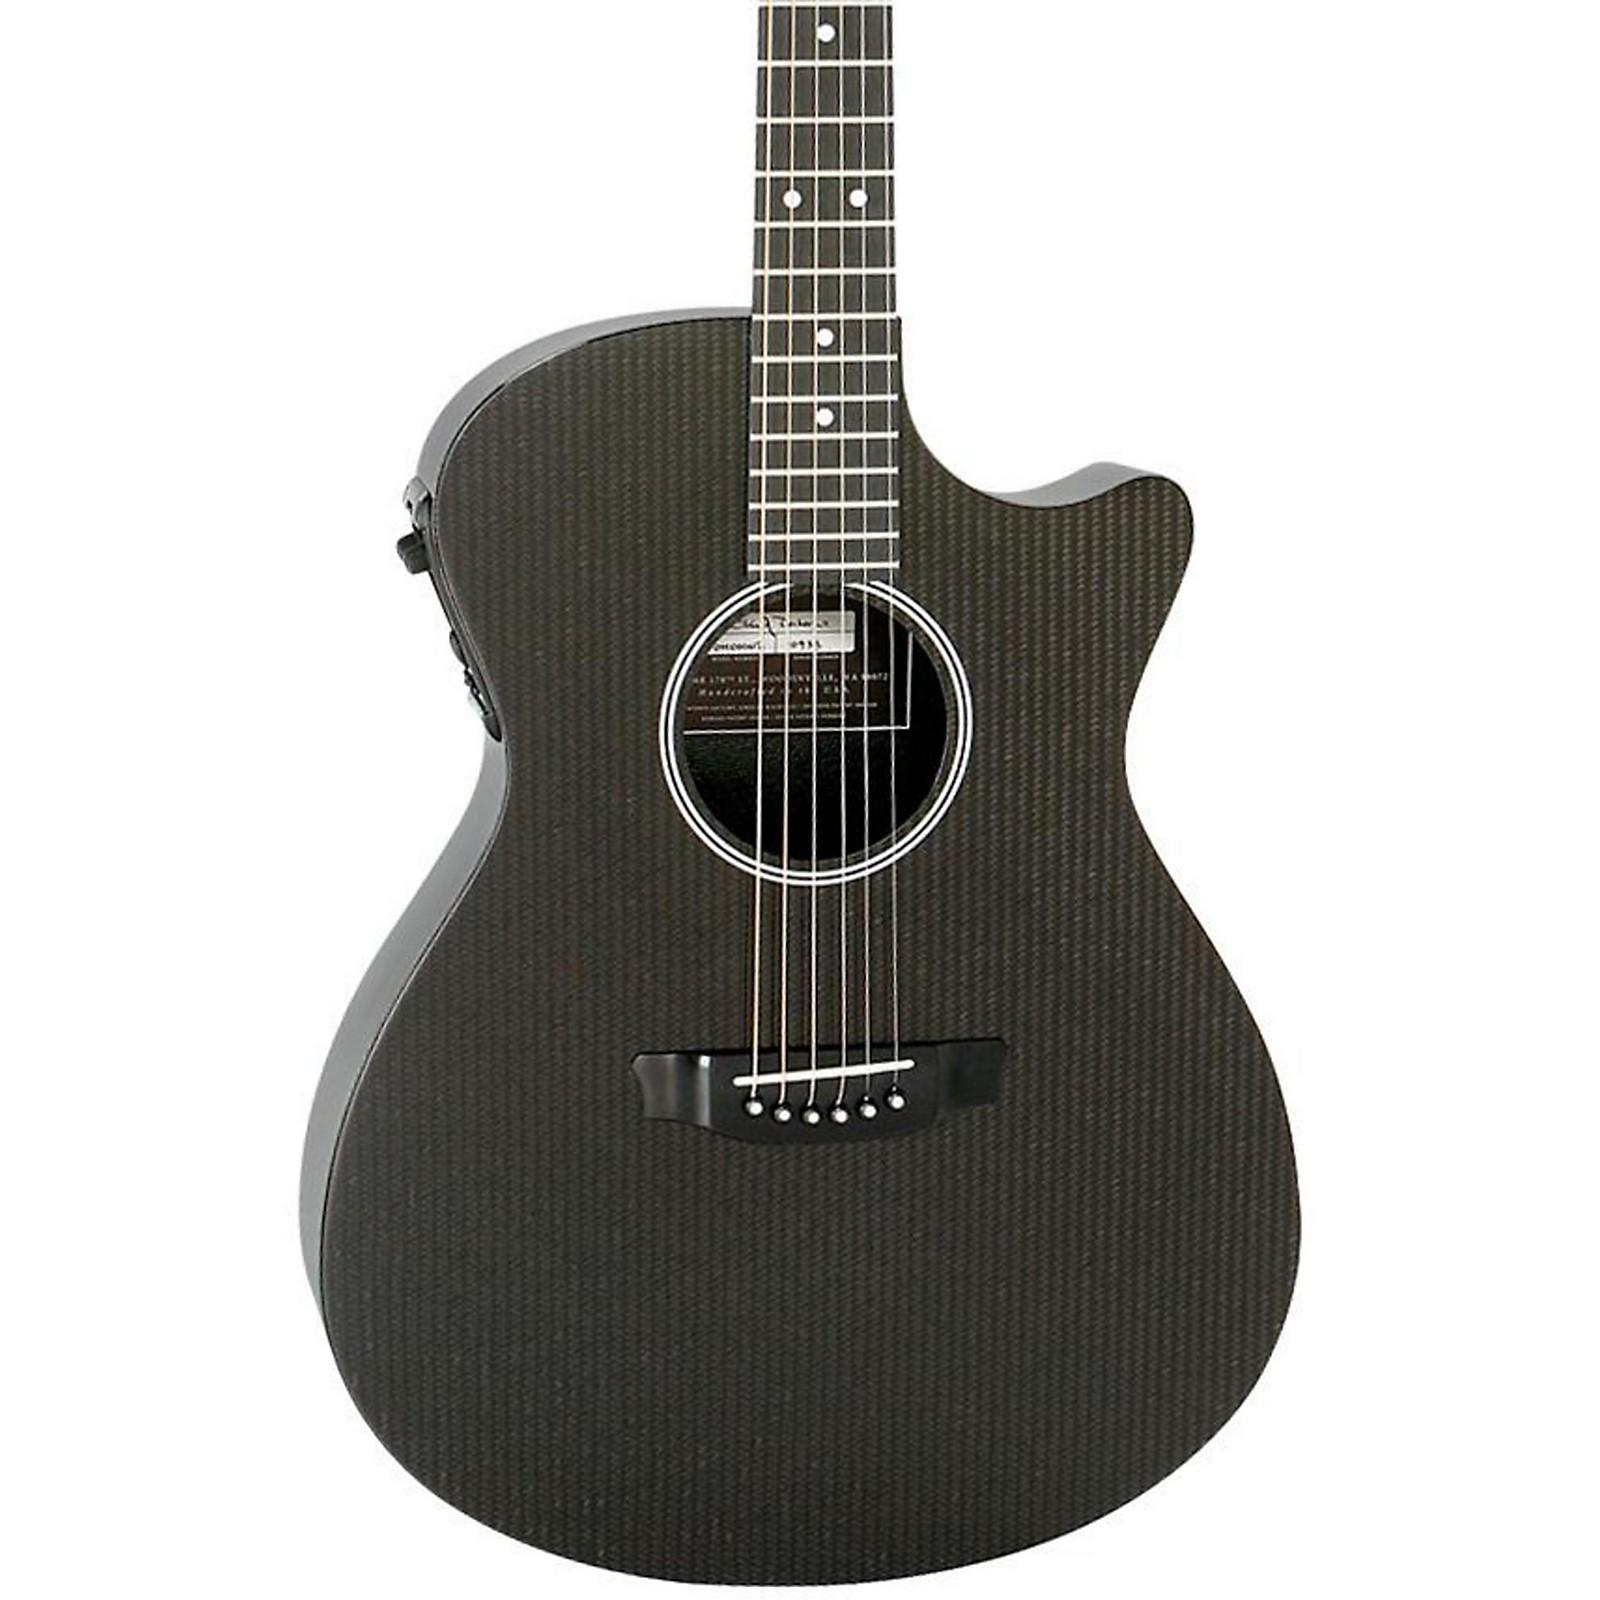 Open Box RainSong Hybrid Series H-OM1000N2 Slim Body Cutaway Acoustic-Electric Guitar